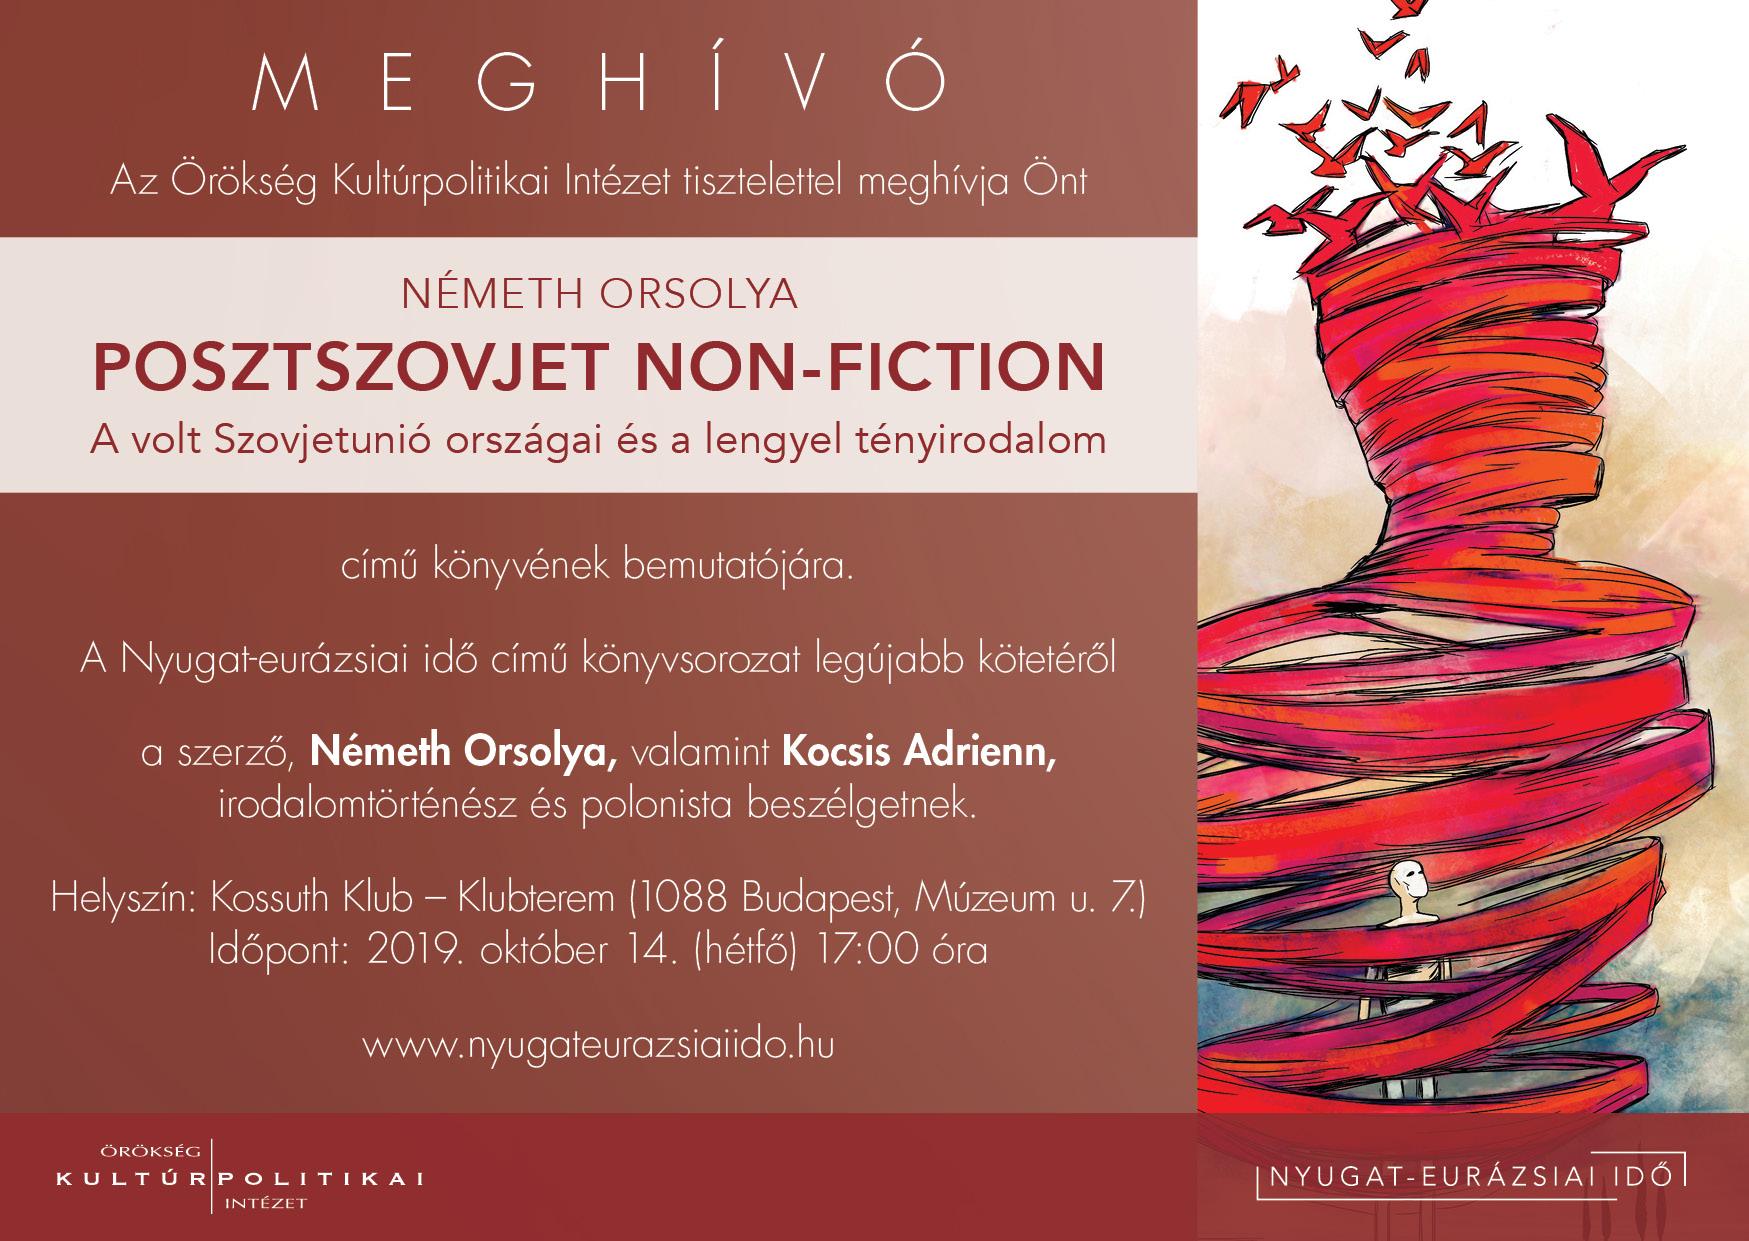 meghivo_no_posztszovjet_non-fiction_a6.jpg